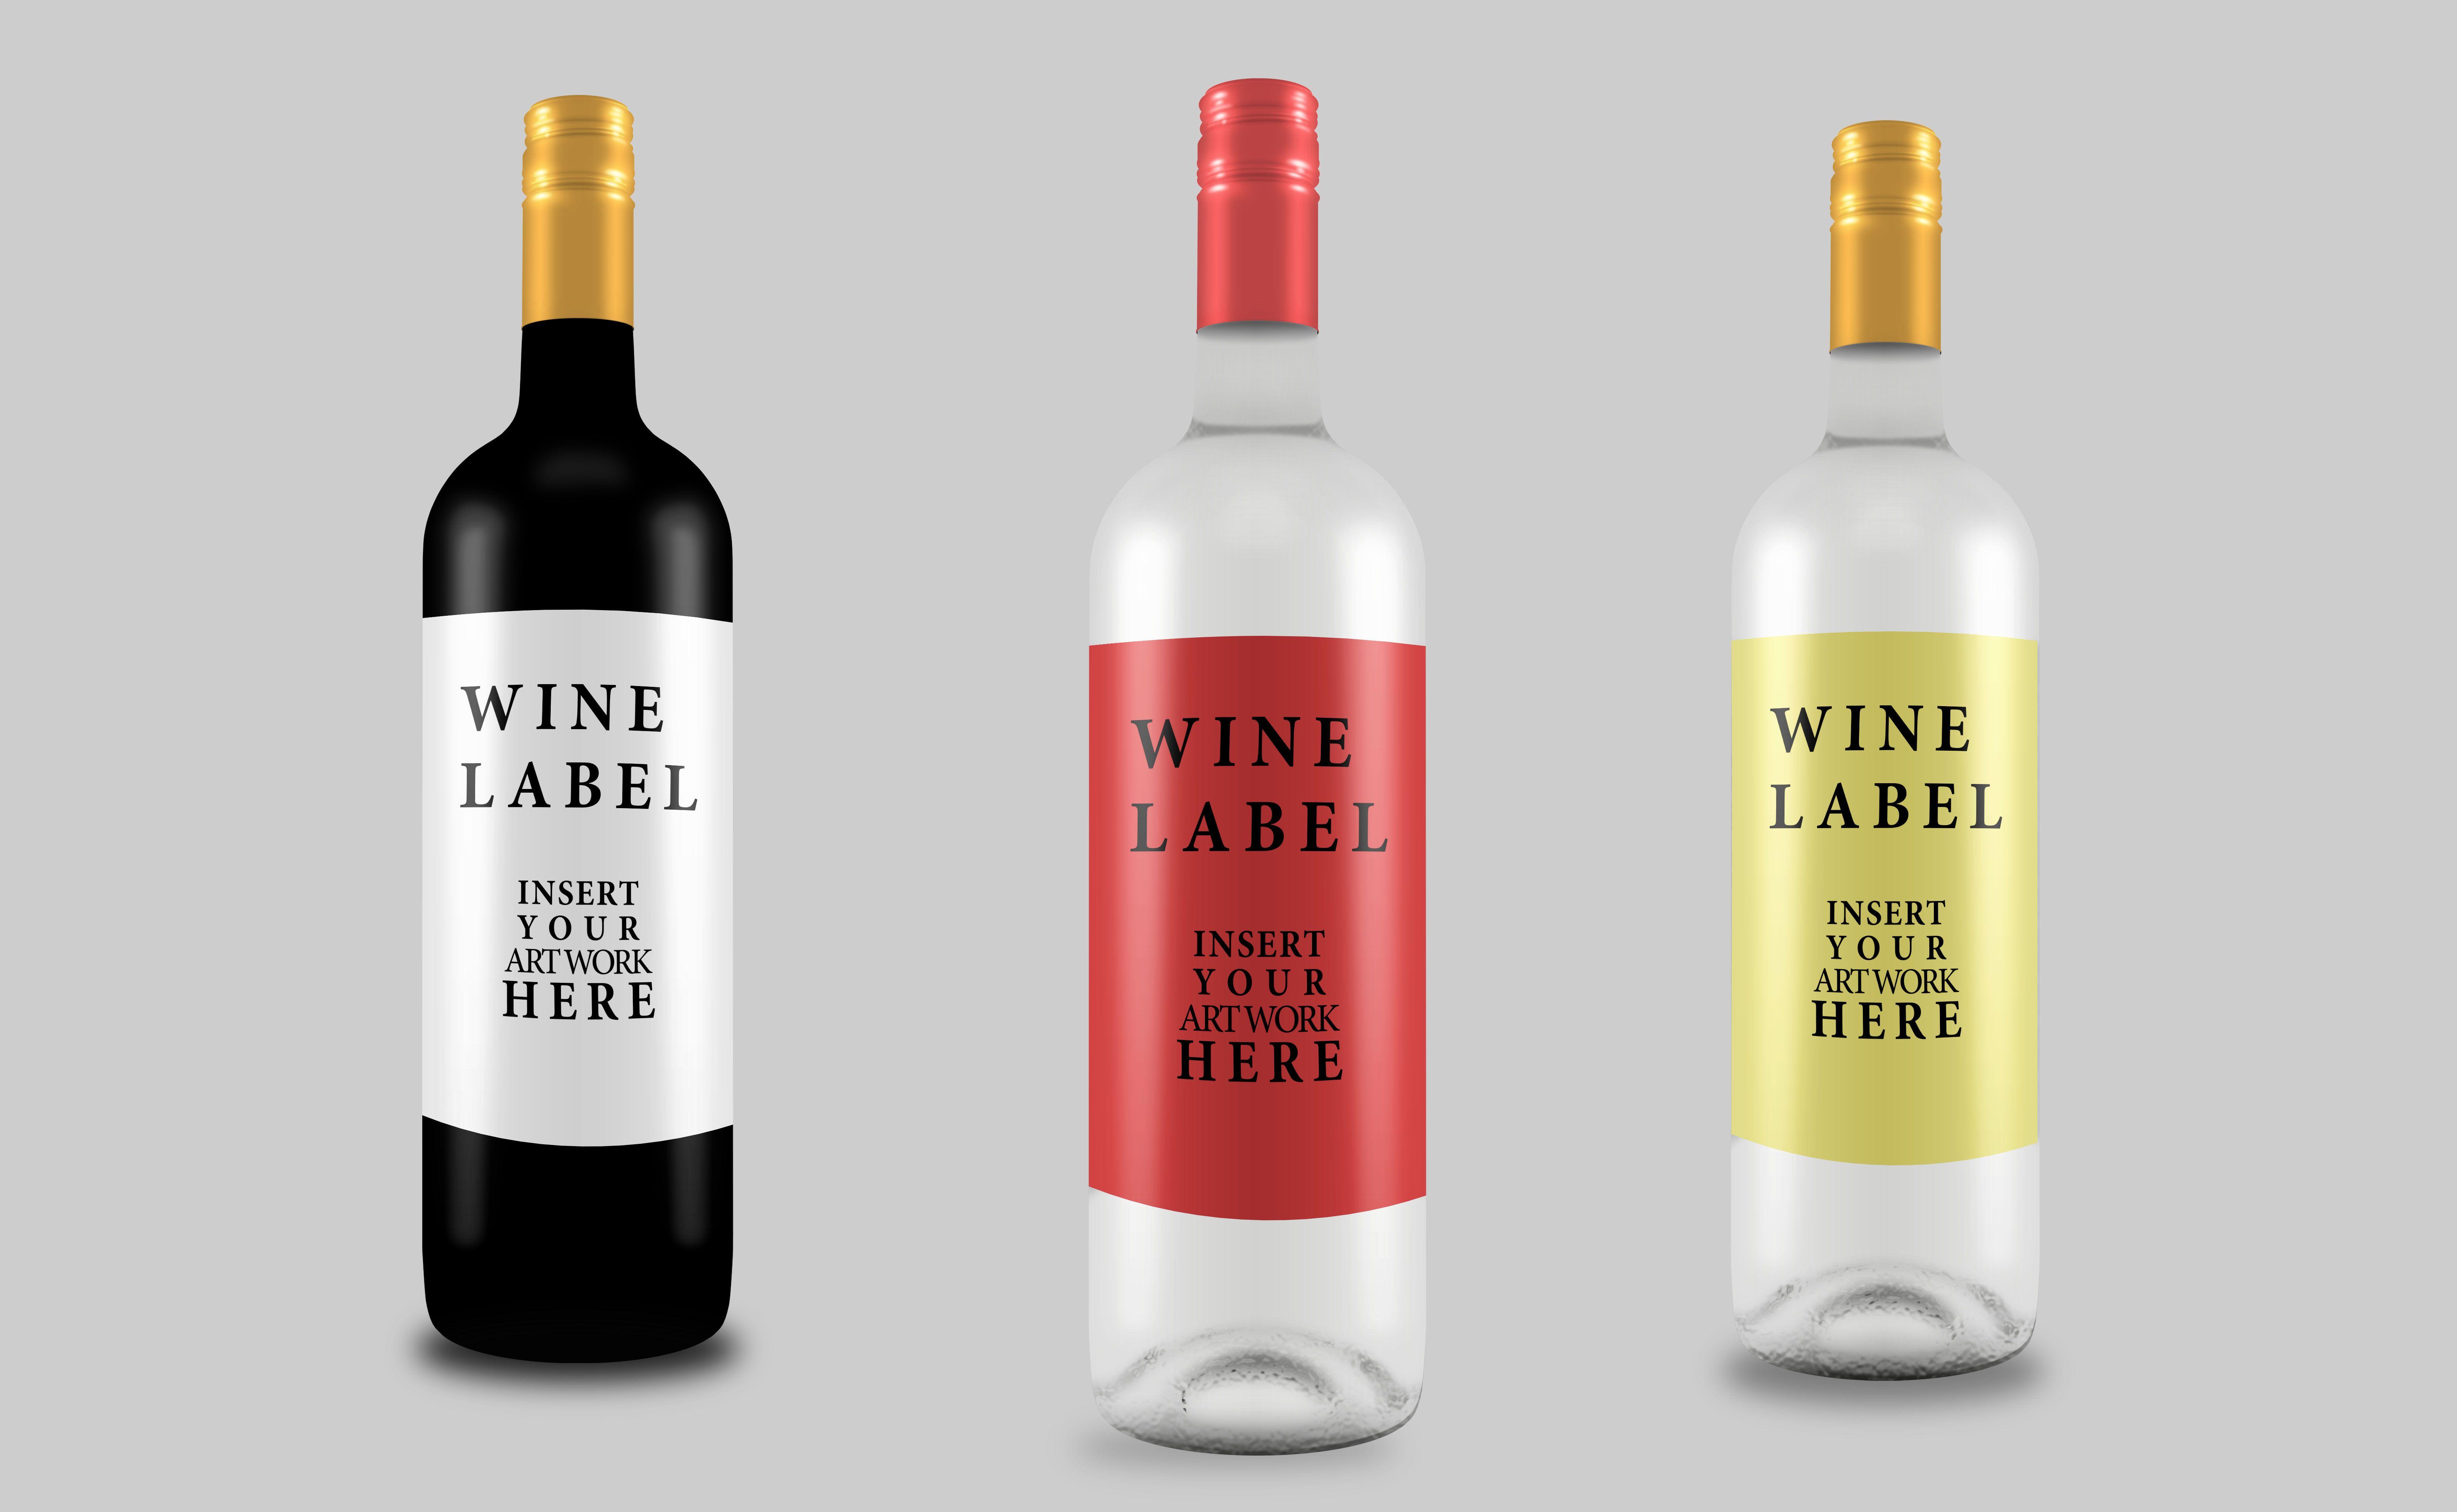 Wine Bottle Mockup For Graphic Designers Wine Mockup Free Wine Bottles Bottle Mockup Wine Bottle Design